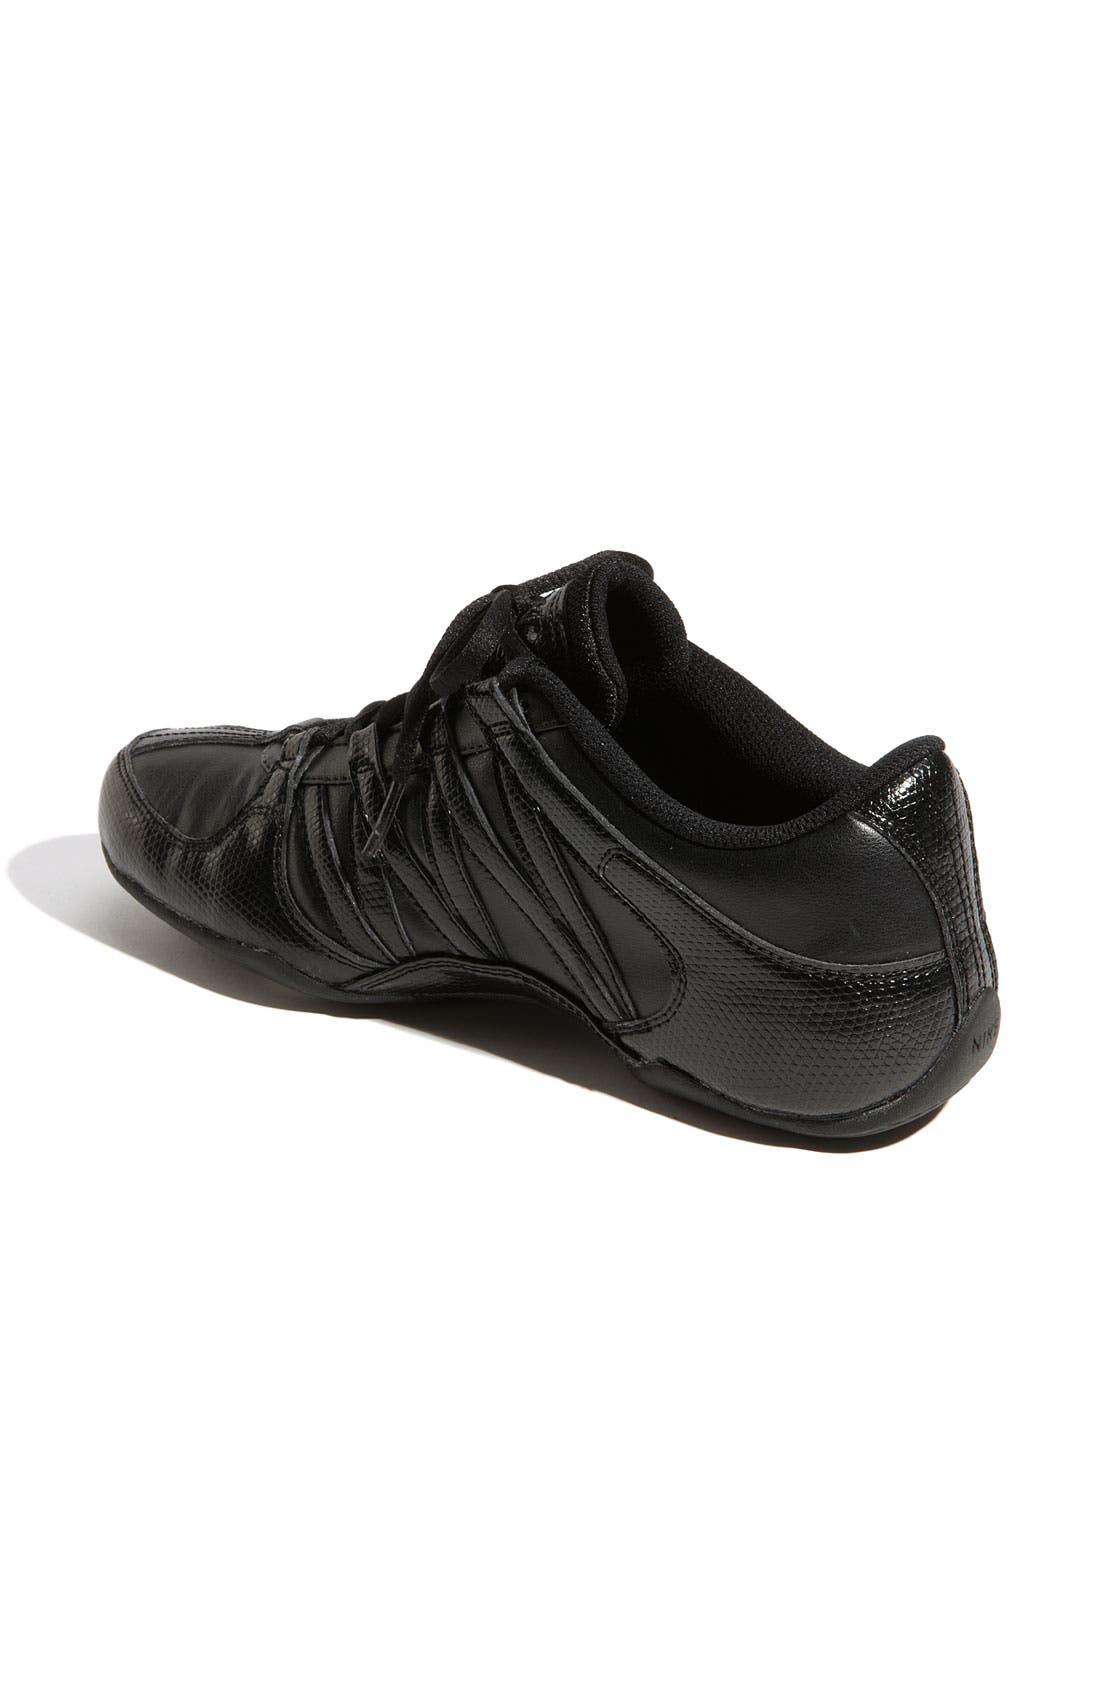 Alternate Image 2  - Nike 'Musique IV' Dance Shoe